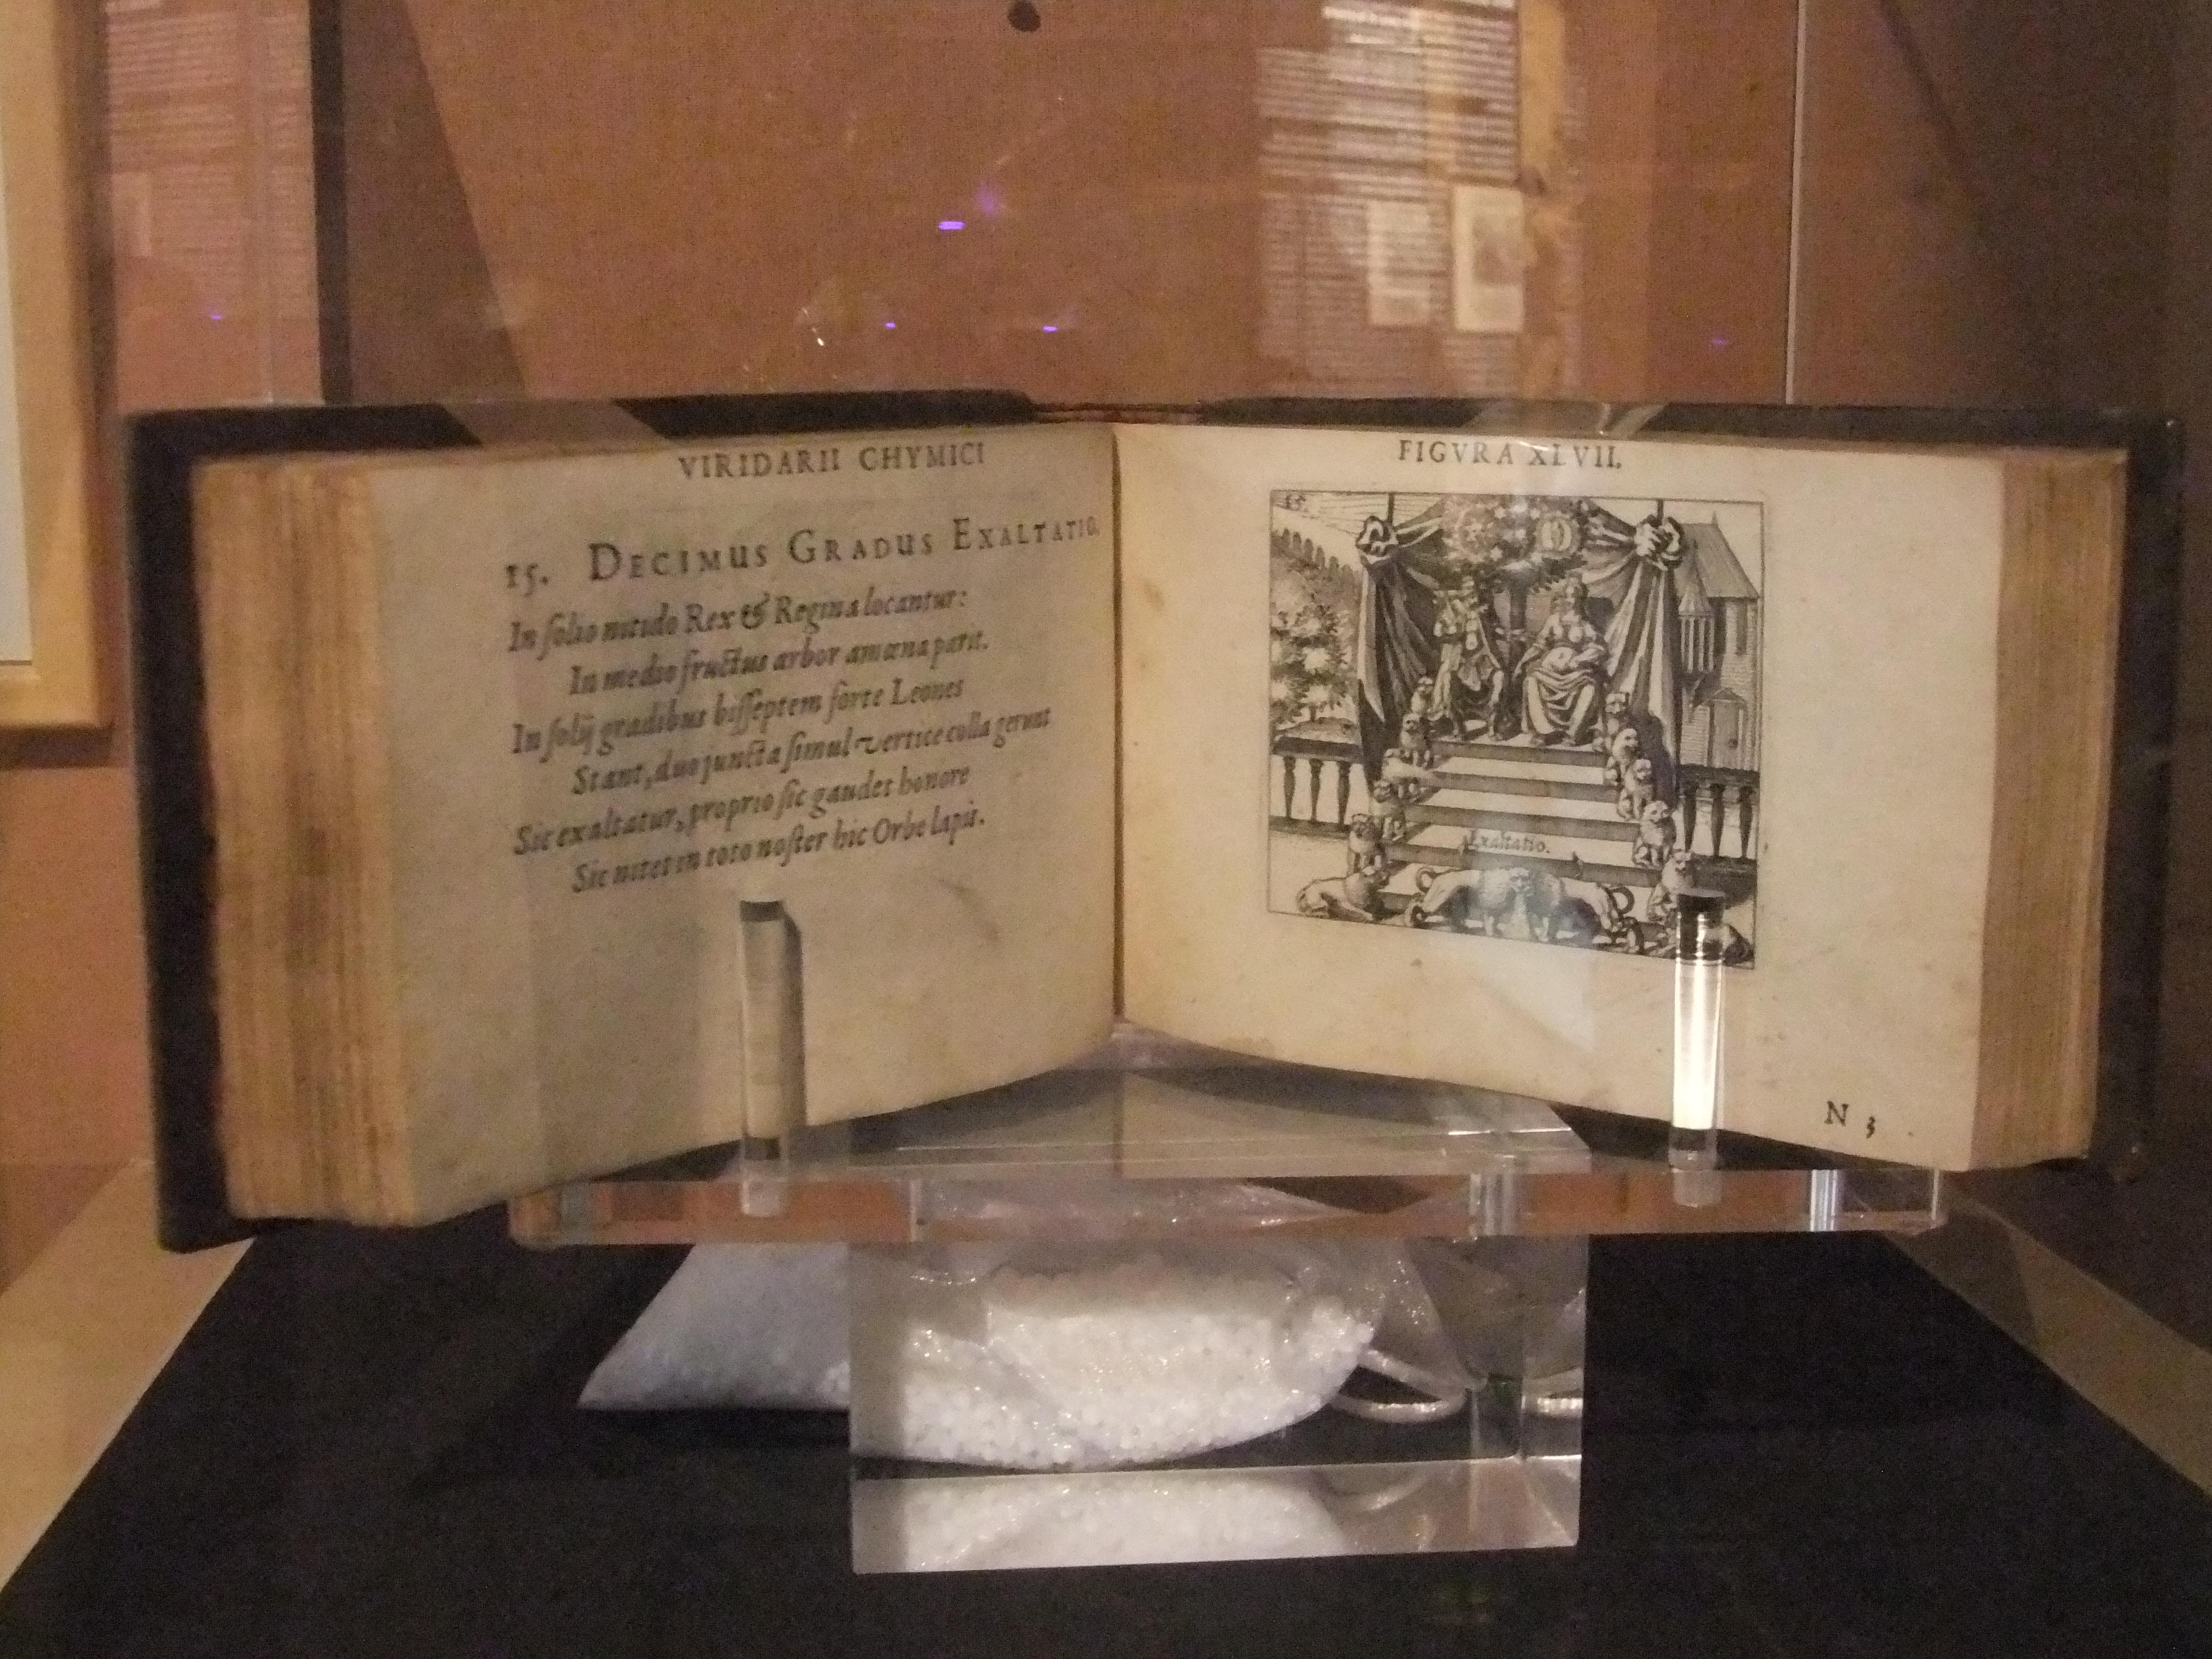 Daniel Stolz von Stolzenberg, Viridarium Chymicum, Francfort, 1624